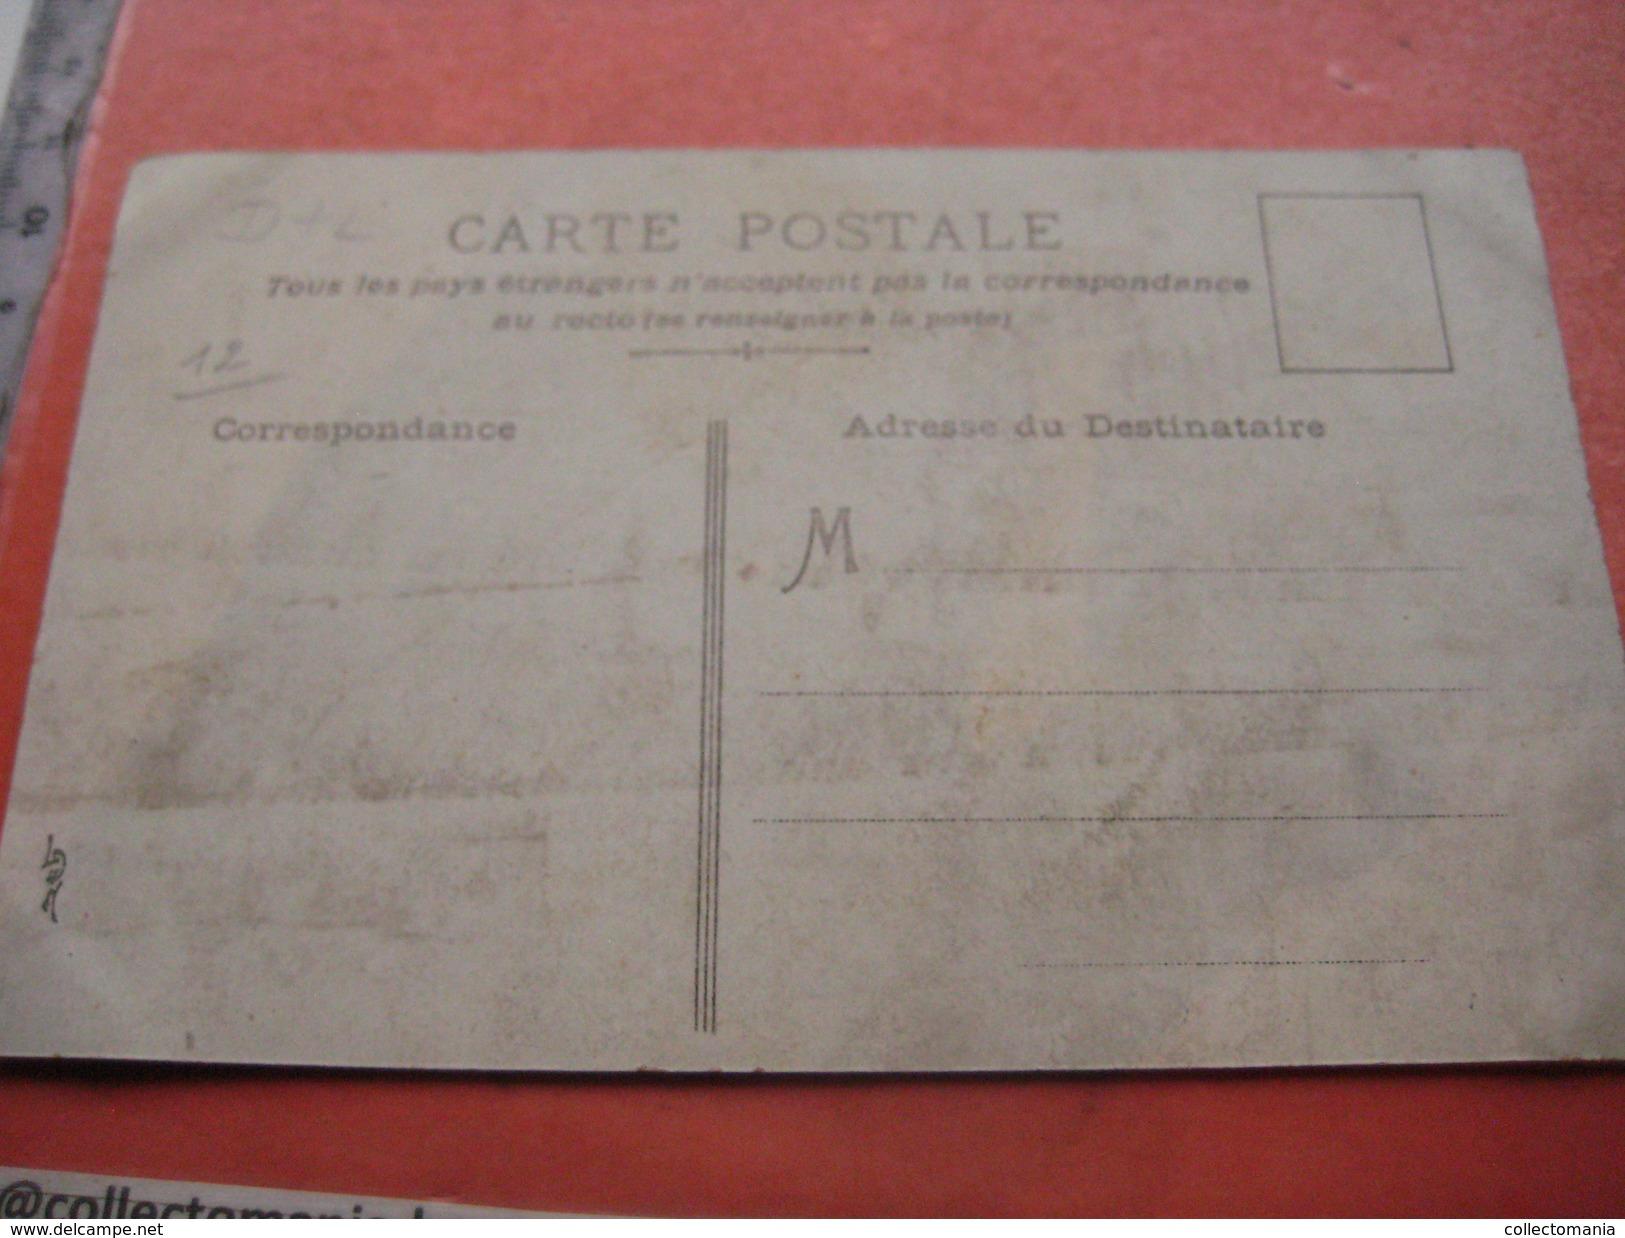 1 Postcard Paris, Police, Carosses - A PLIER SUR LES TRAITS - Mechanical Card ( To Be Plead To Be Standing Up) L. D. H. - Humour